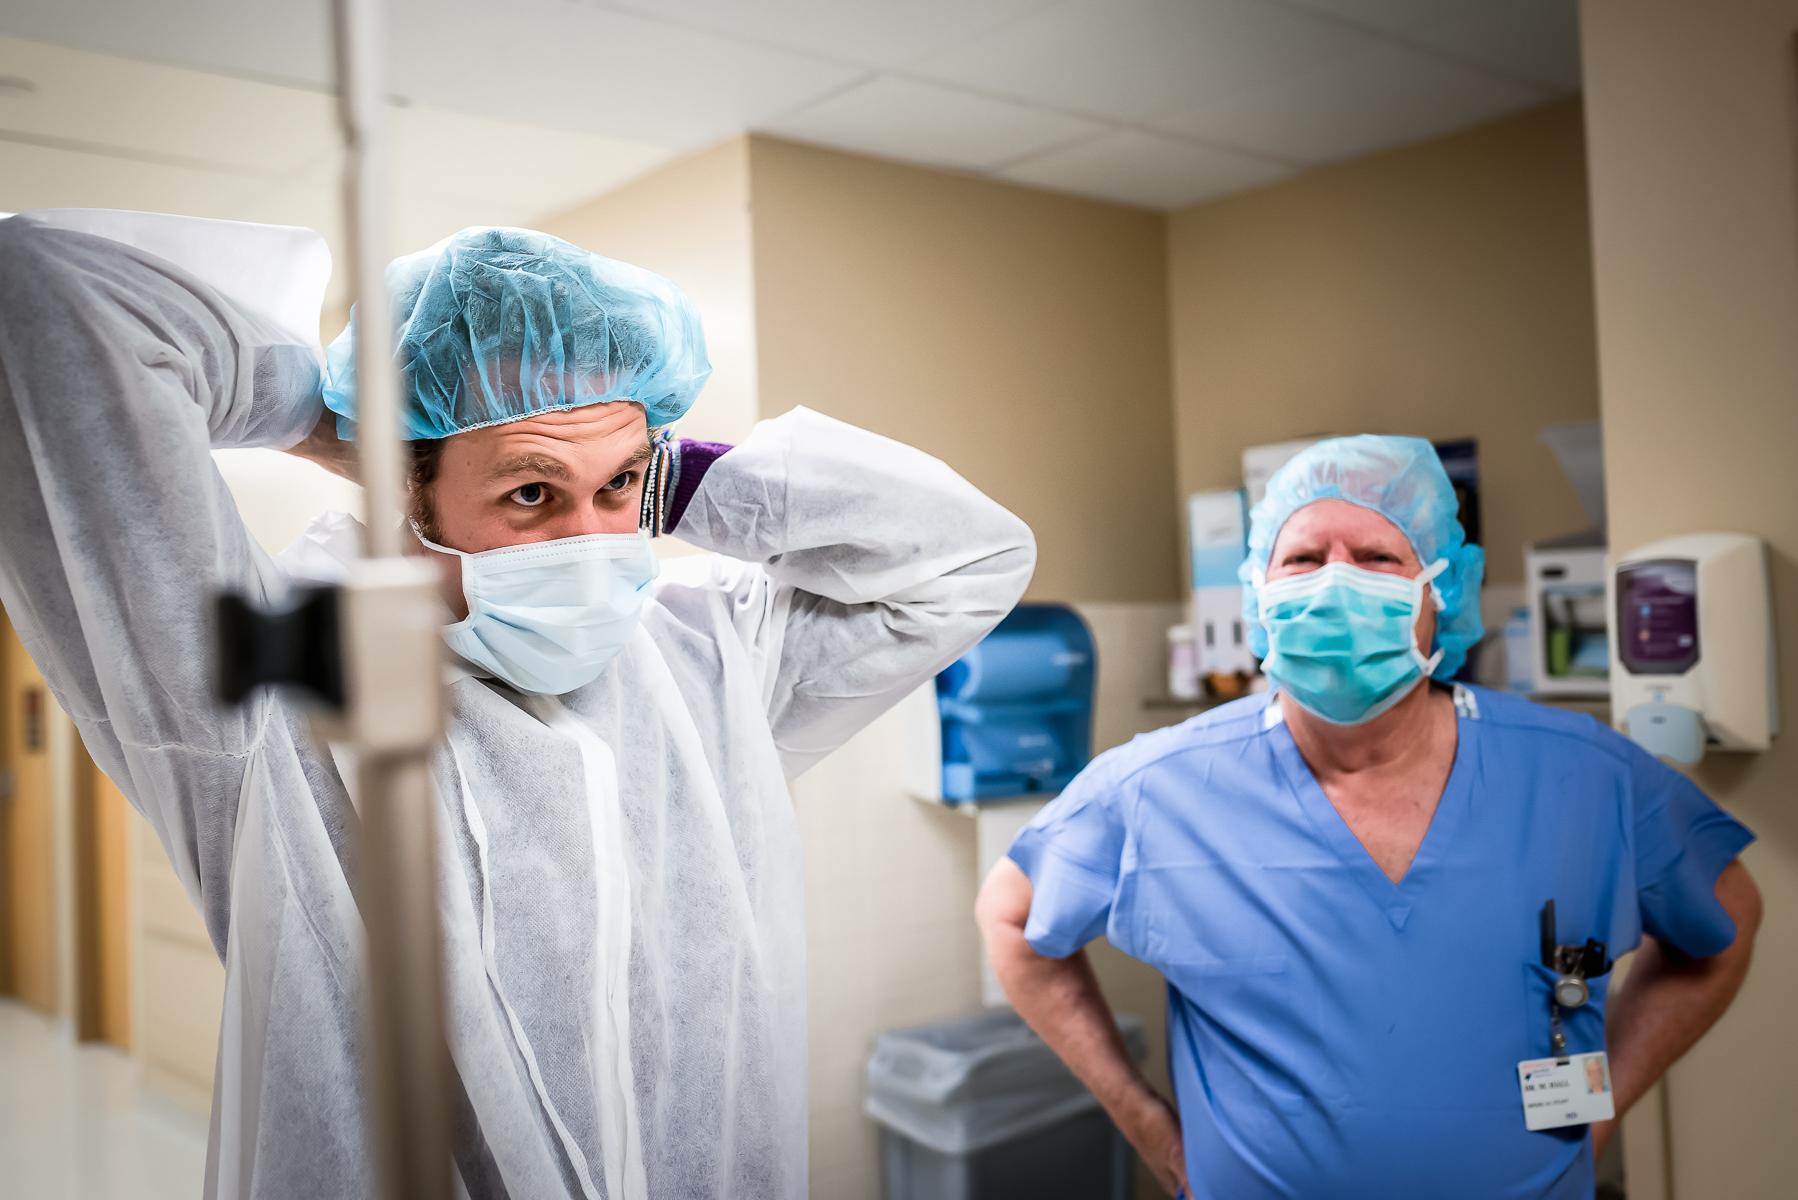 denver-birth-photographer-dad-preparing-c-section